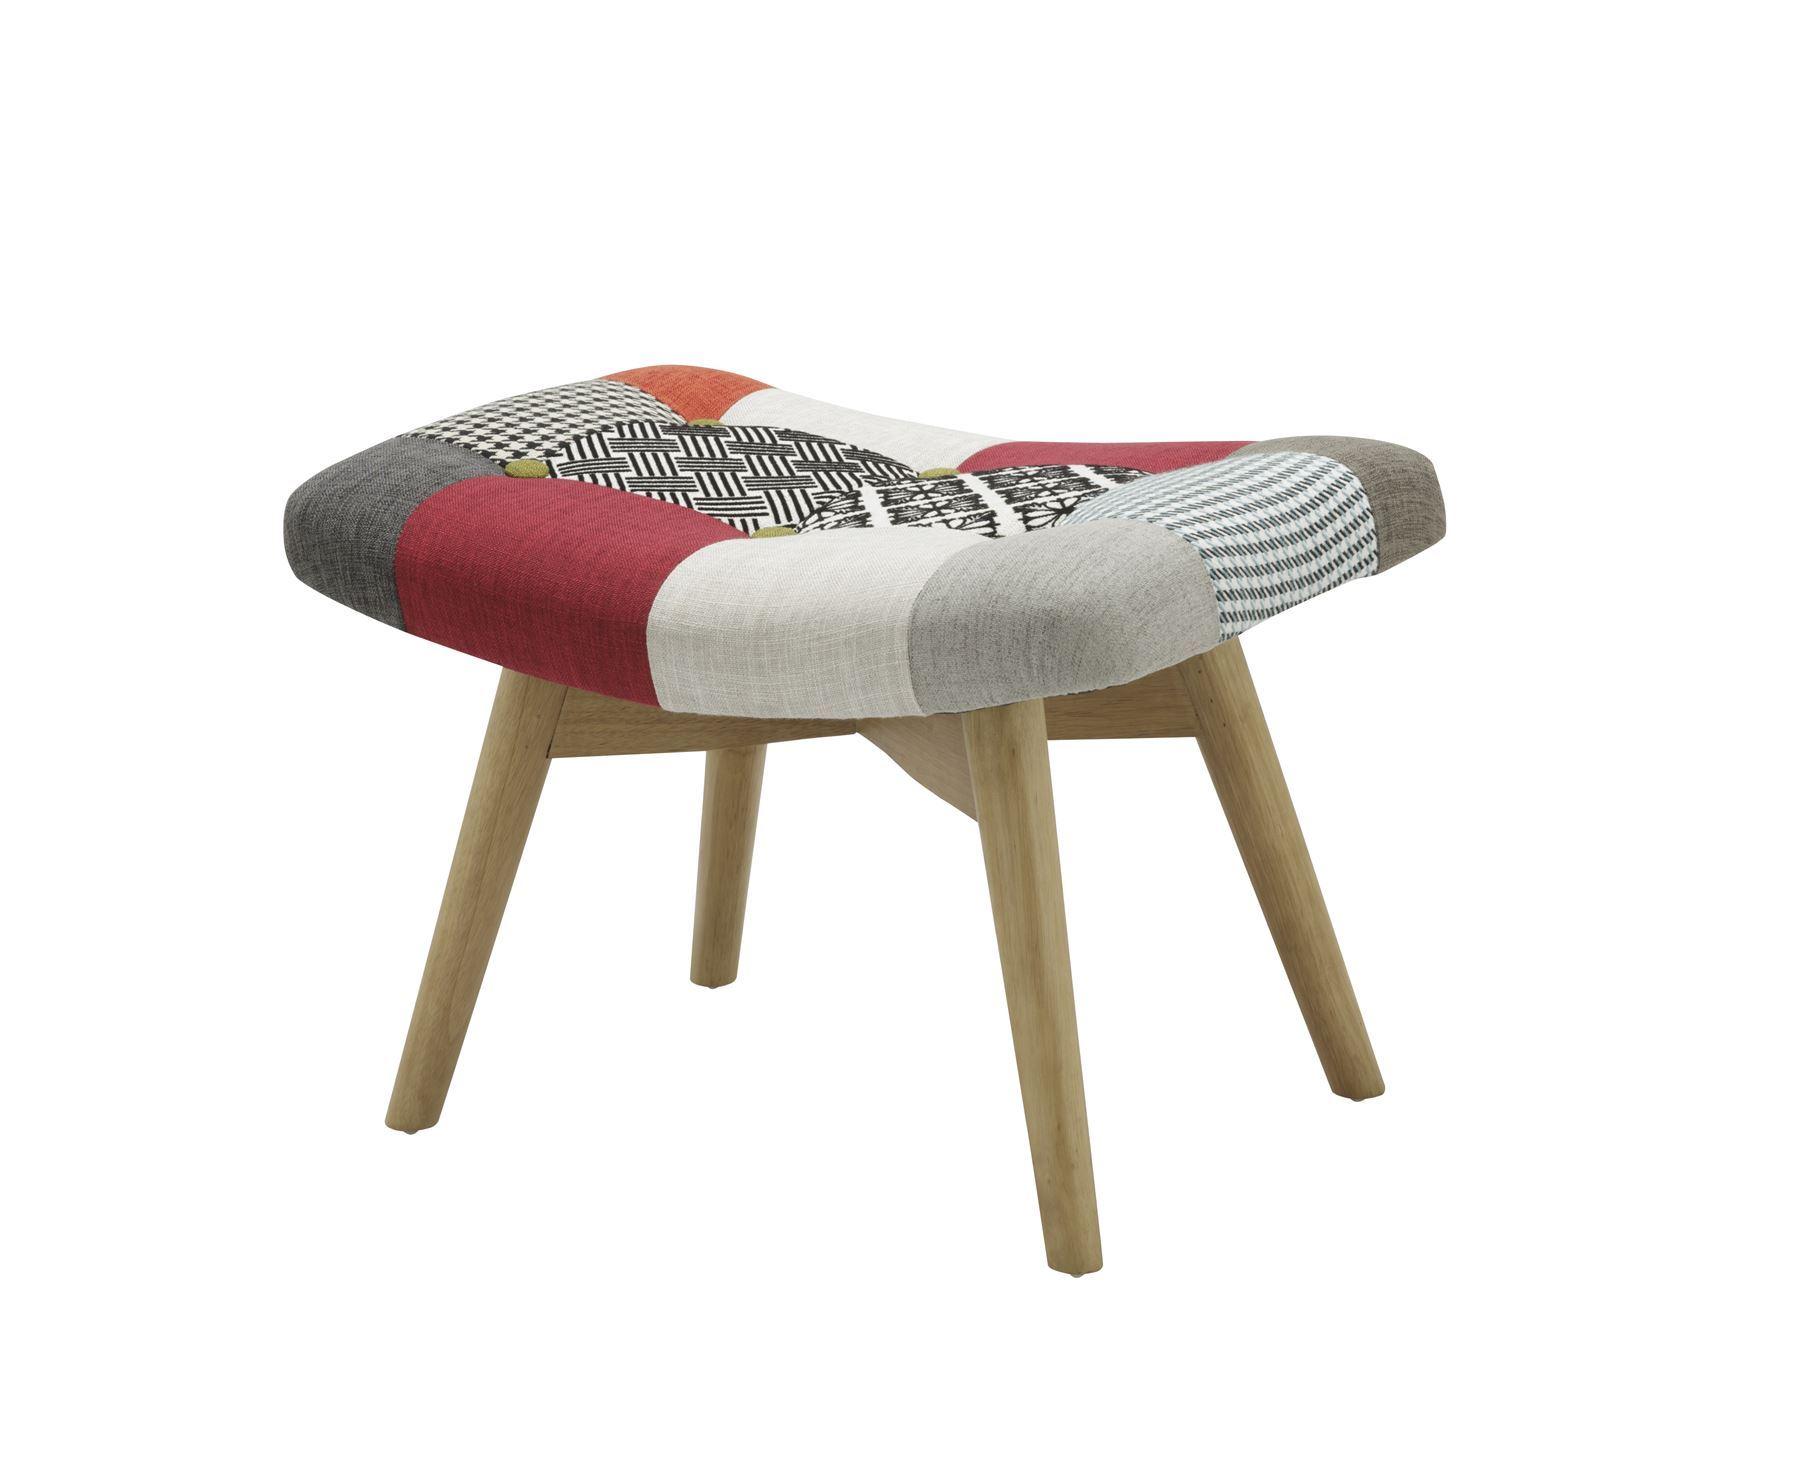 Birlea Sloane Stool Chair Scandinavian Modern Retro Patchwork